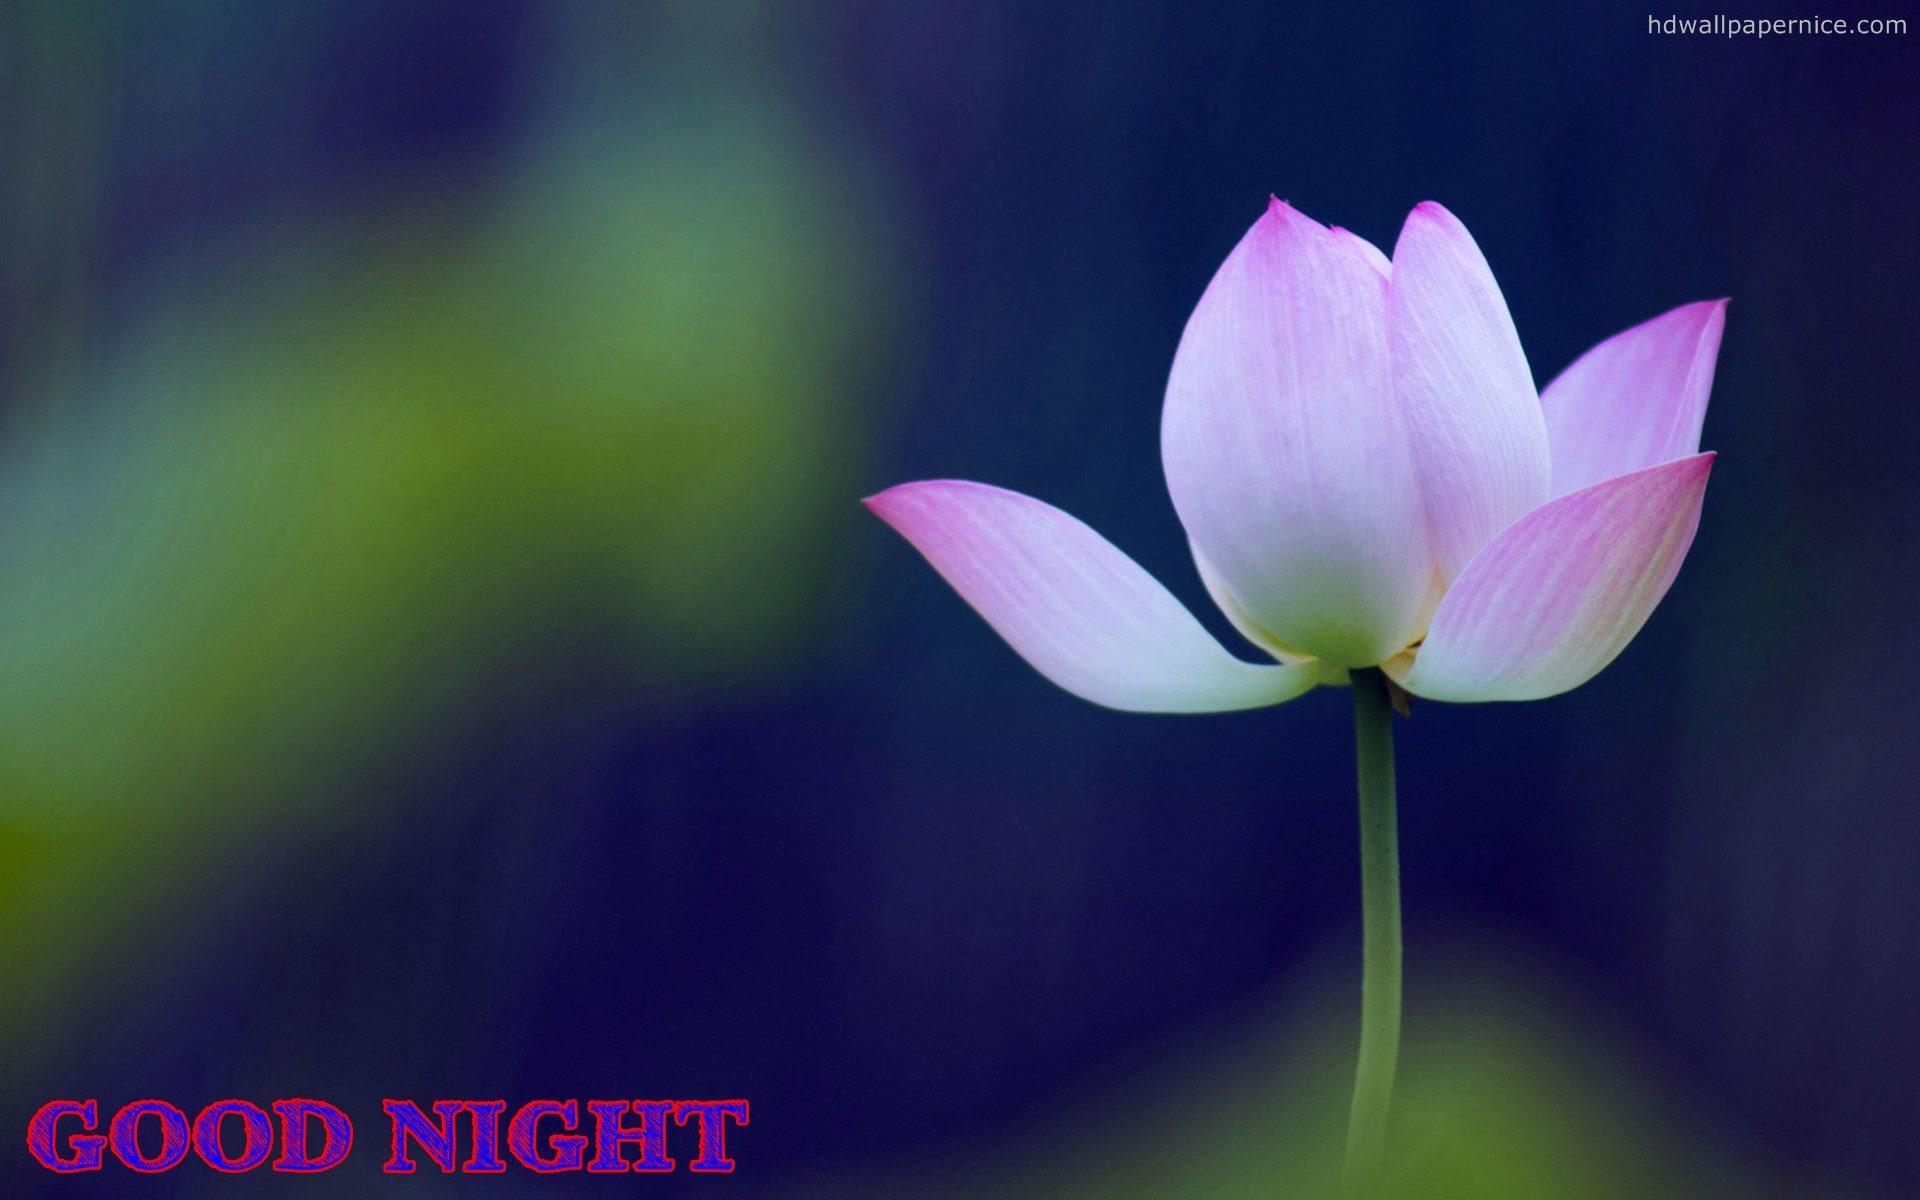 Good Night Flower Wallpapers Free Good Night Wallpaper New Wallpaper Good Night Hd 1920x1200 Wallpaper Teahub Io